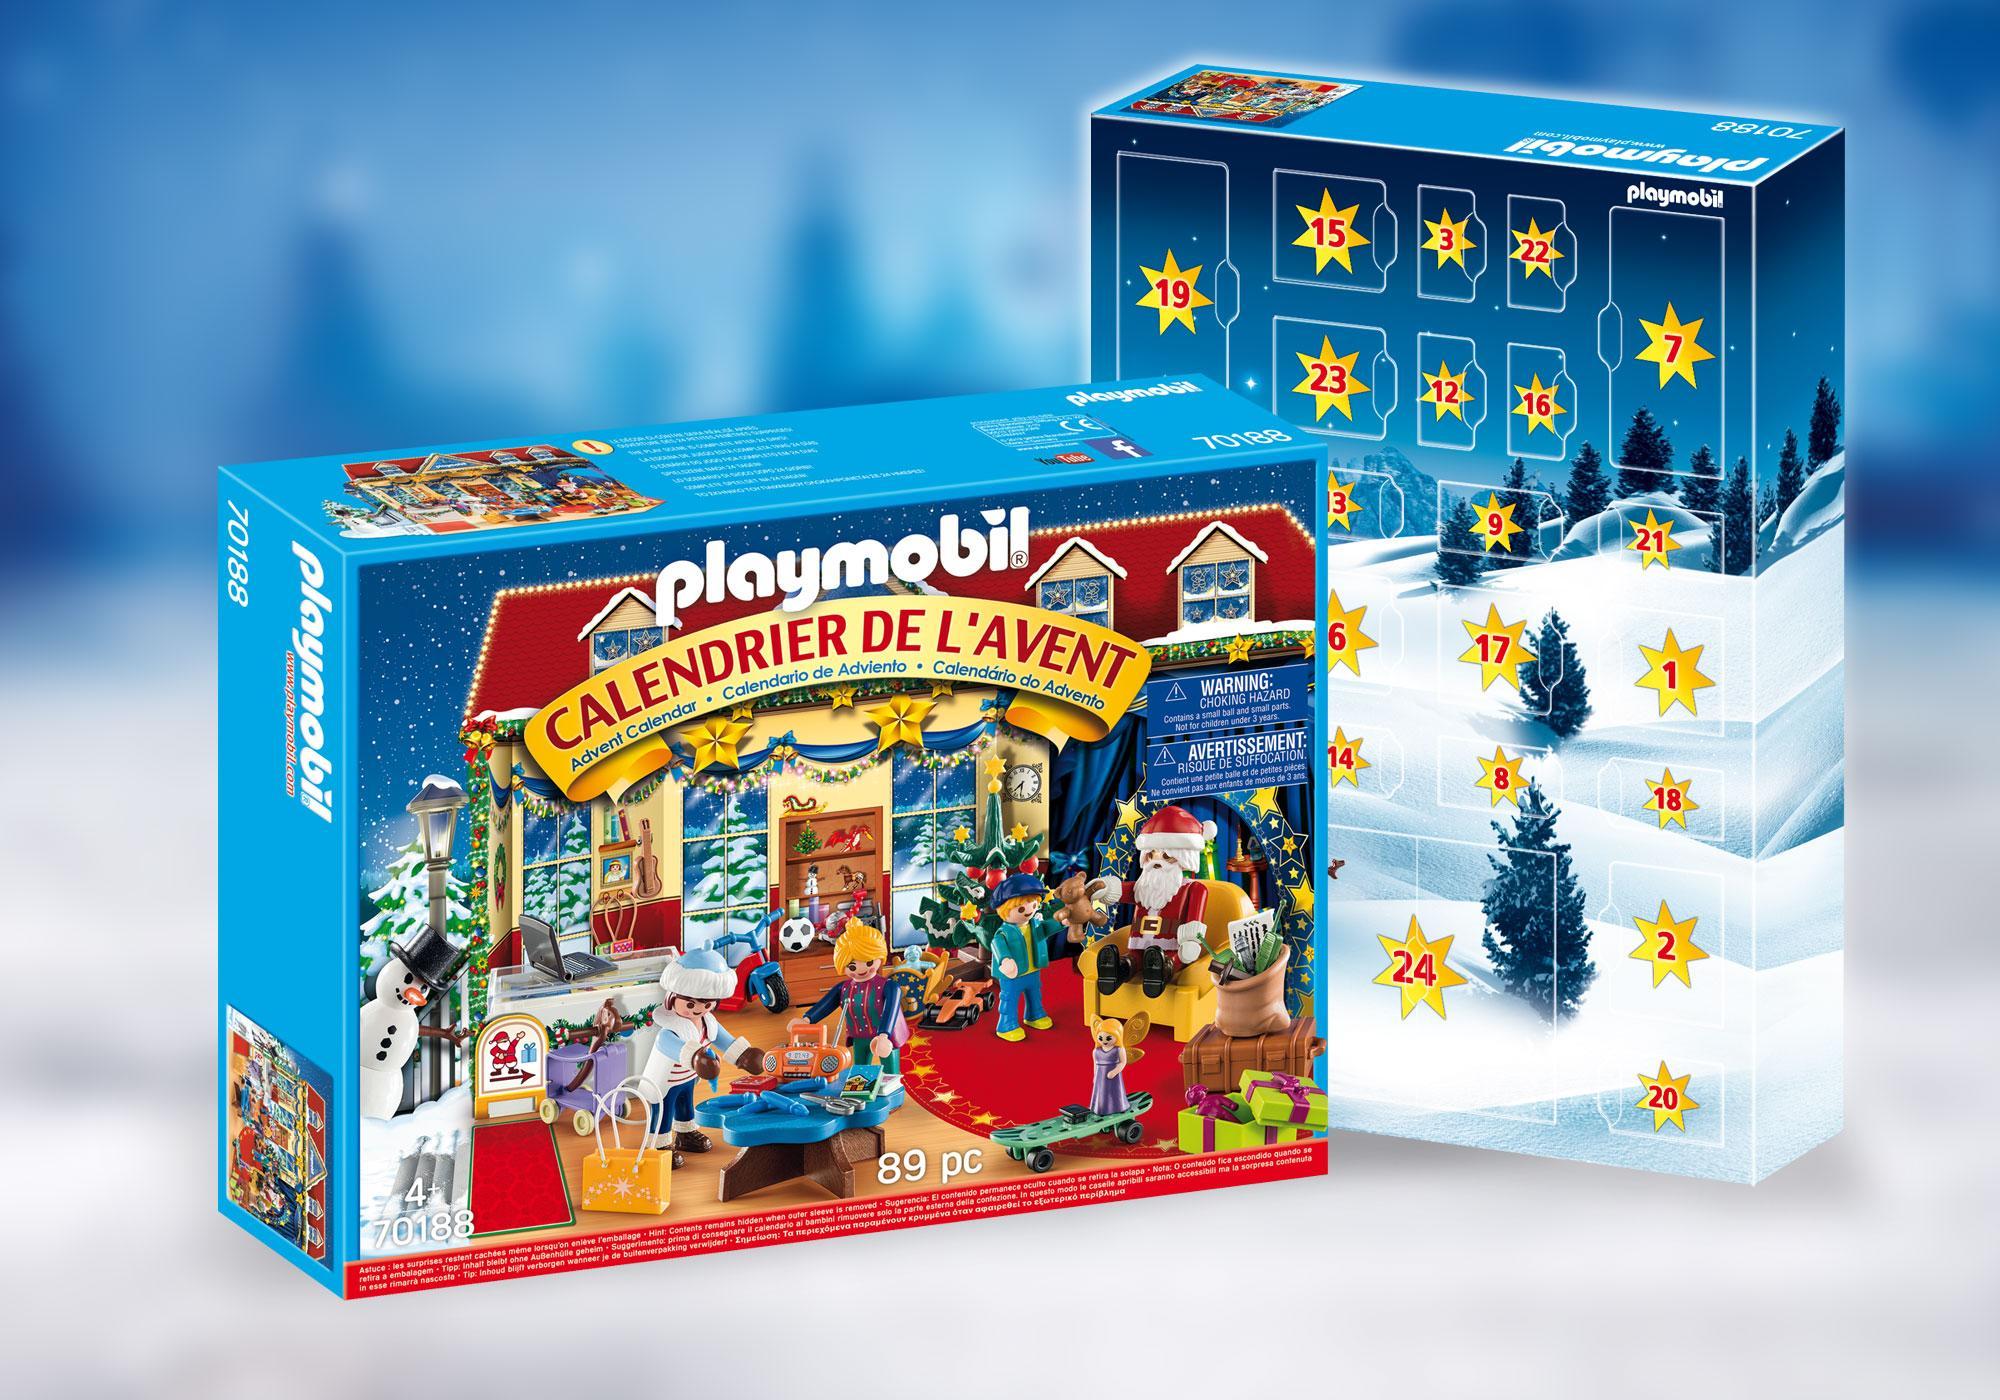 "http://media.playmobil.com/i/playmobil/70188_product_detail/Calendrier de l'Avent ""Boutique de jouets"""